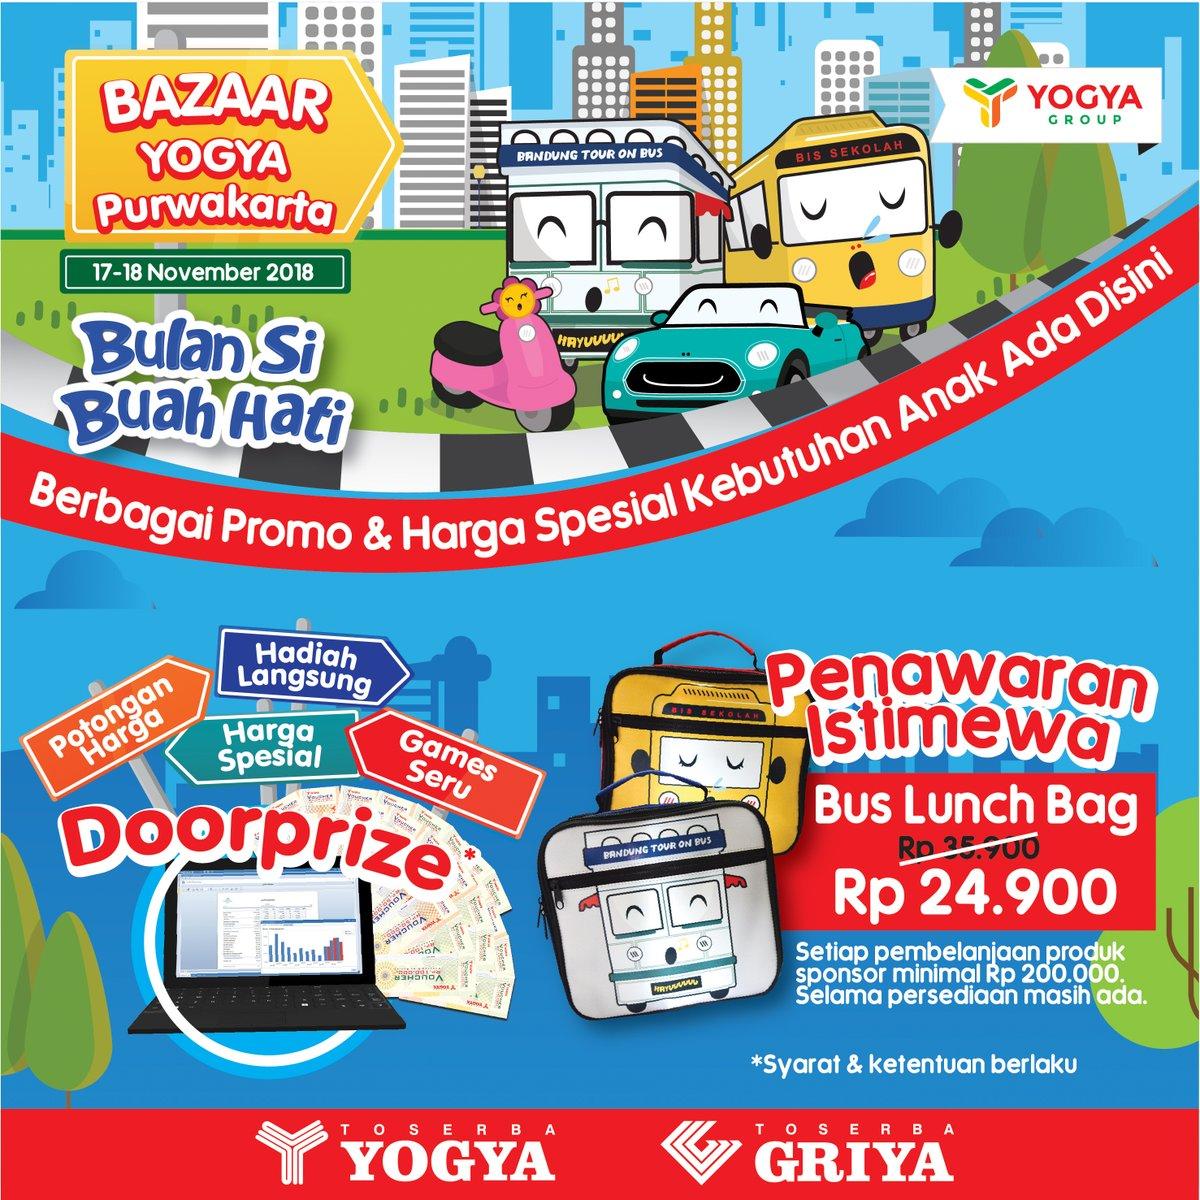 Yogya - Promo Bulan SiBuah Hati di Yogya Bogor & Yogya Purwakarta (17-18 Nov 2018)